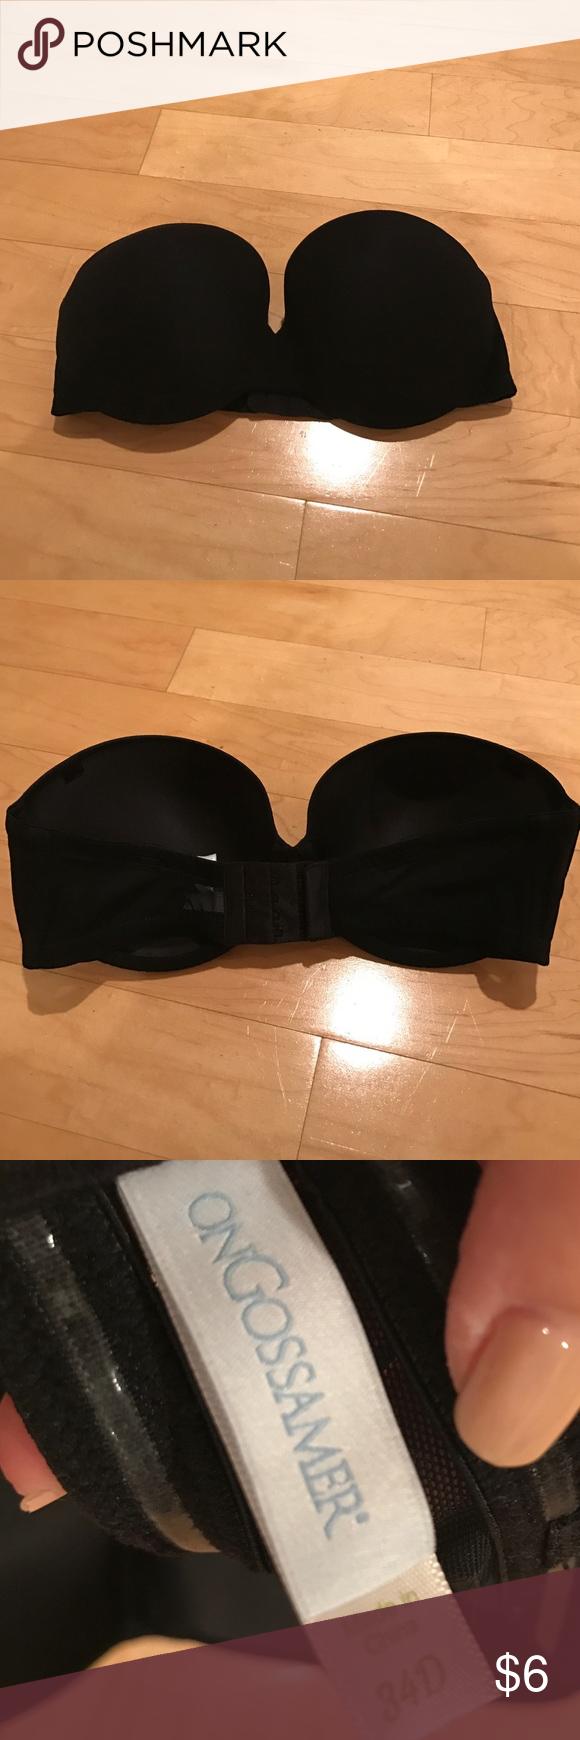 Ongossamer Strapless Black Bra 34 D Never worn, ripped tags off ongossamer Intimates & Sleepwear Bras